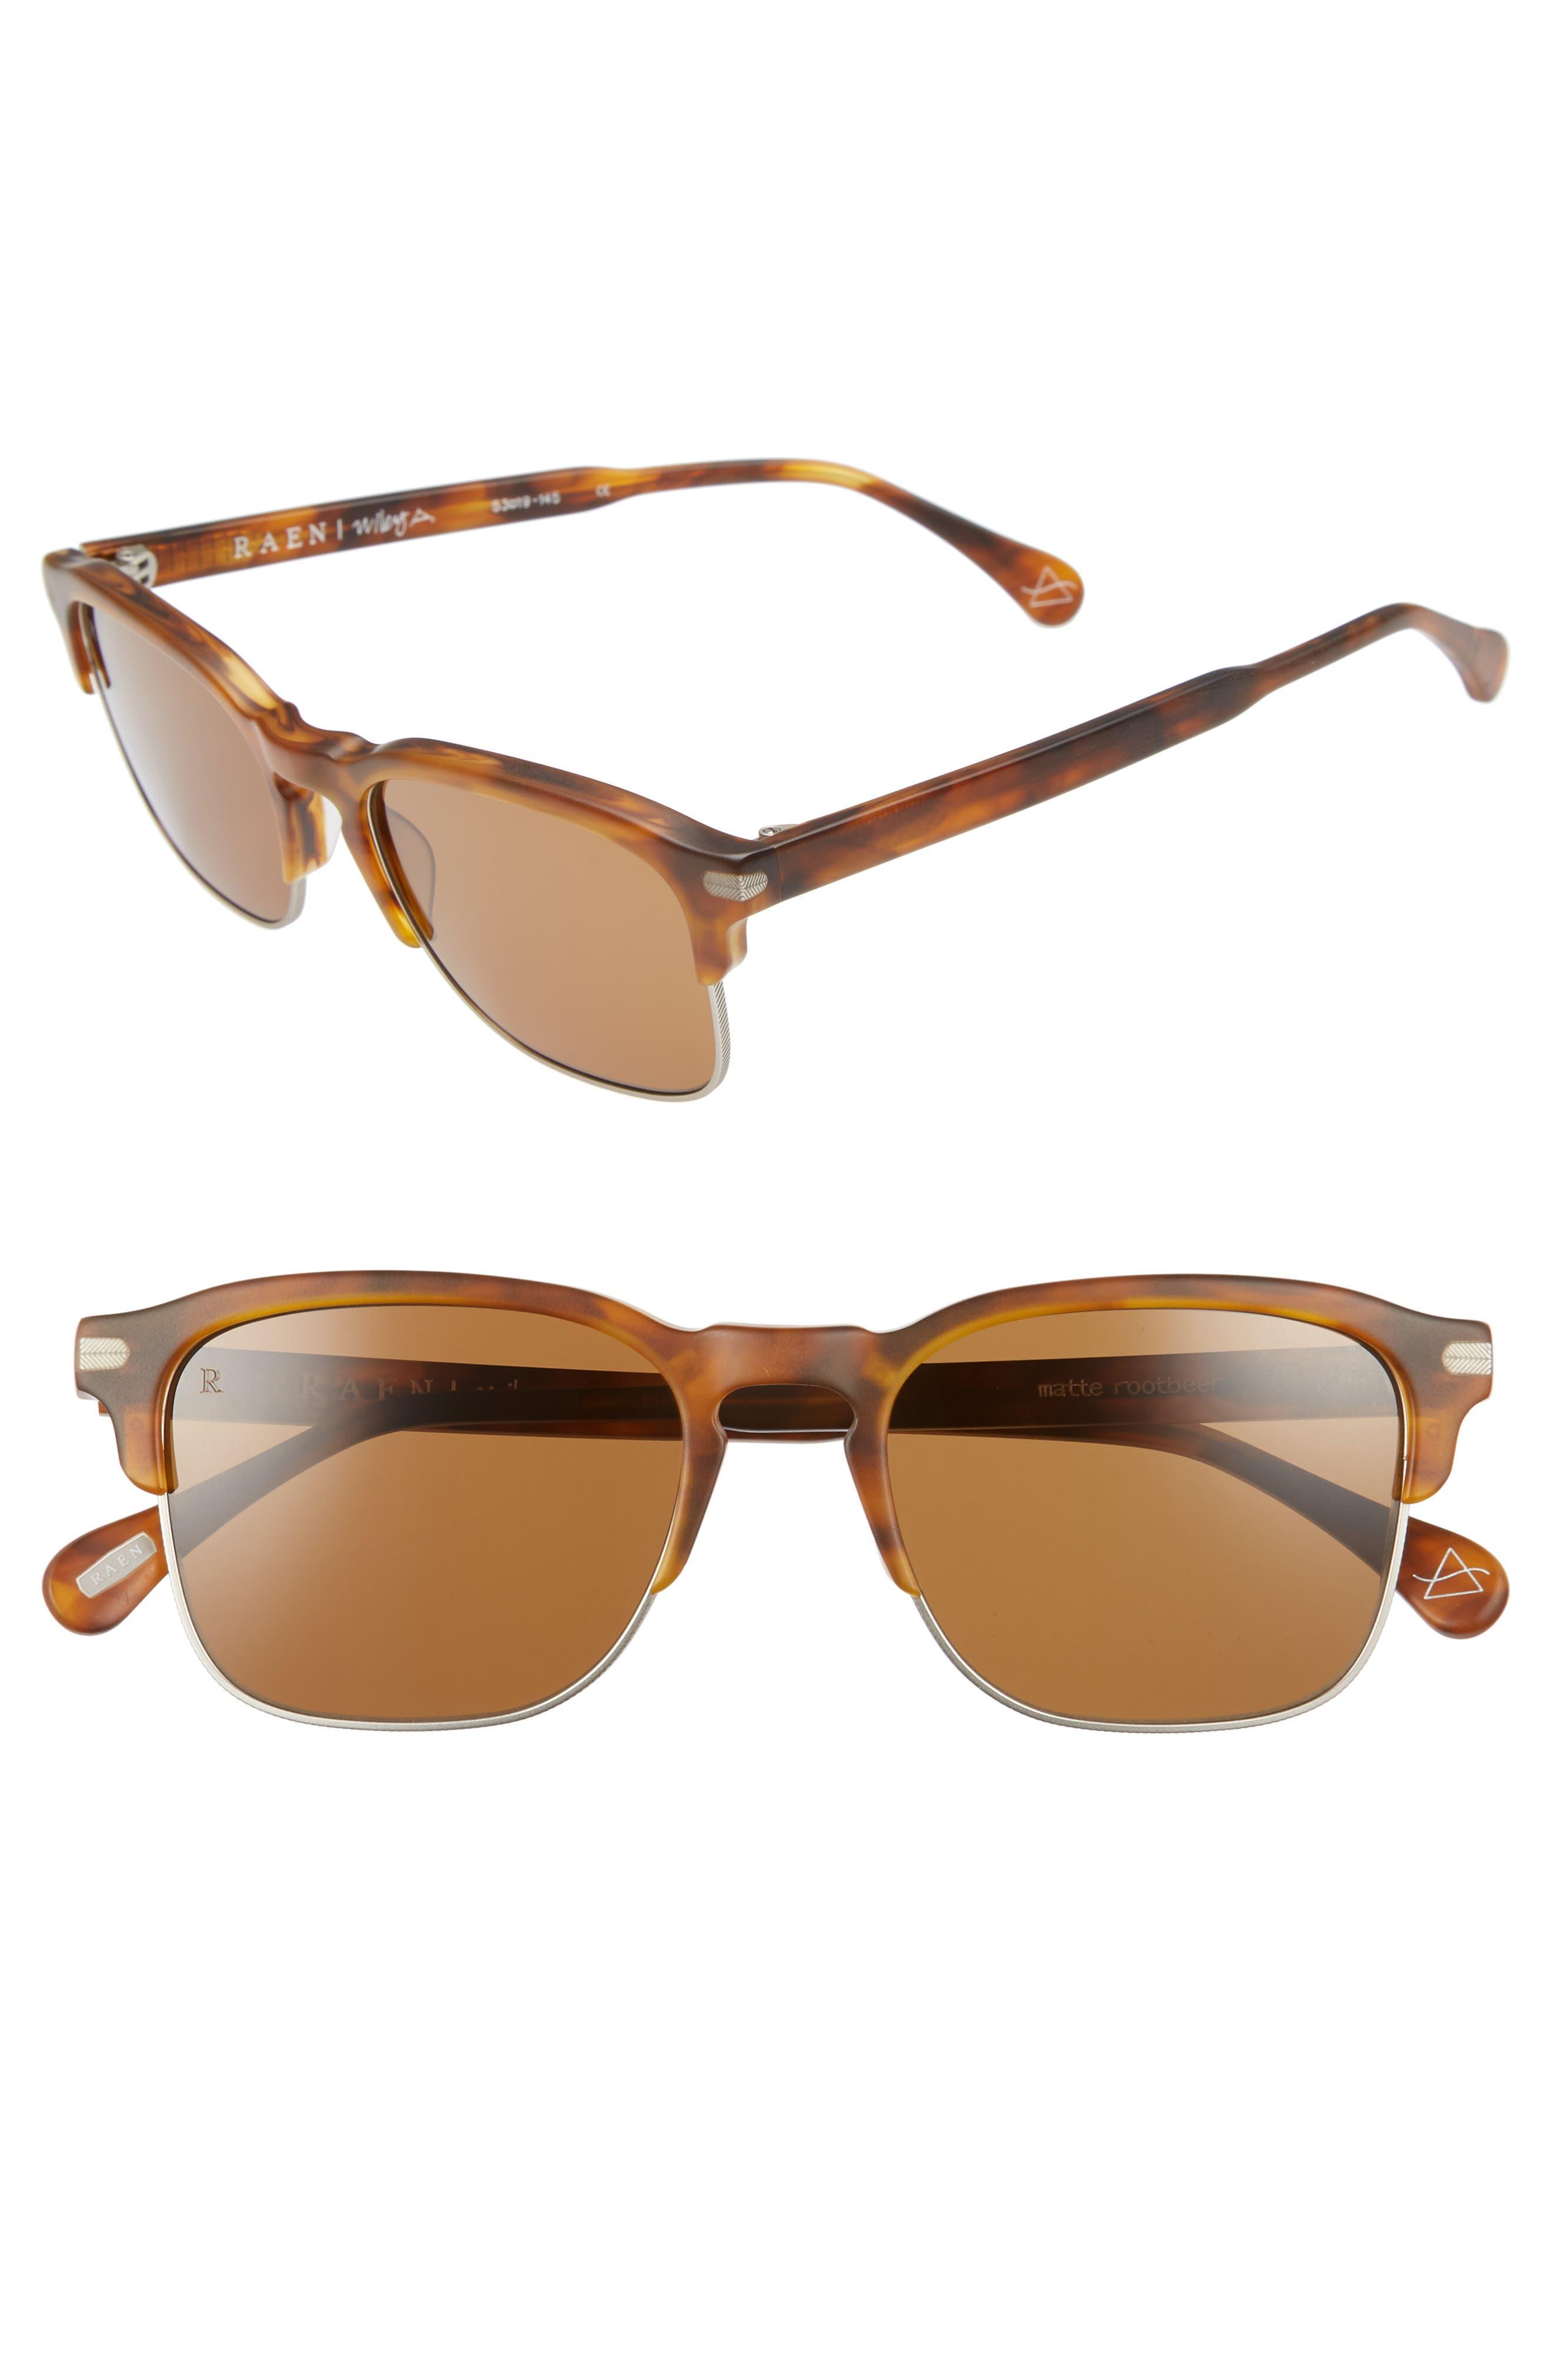 RAEN Wiley A 53Mm Sunglasses - Americano